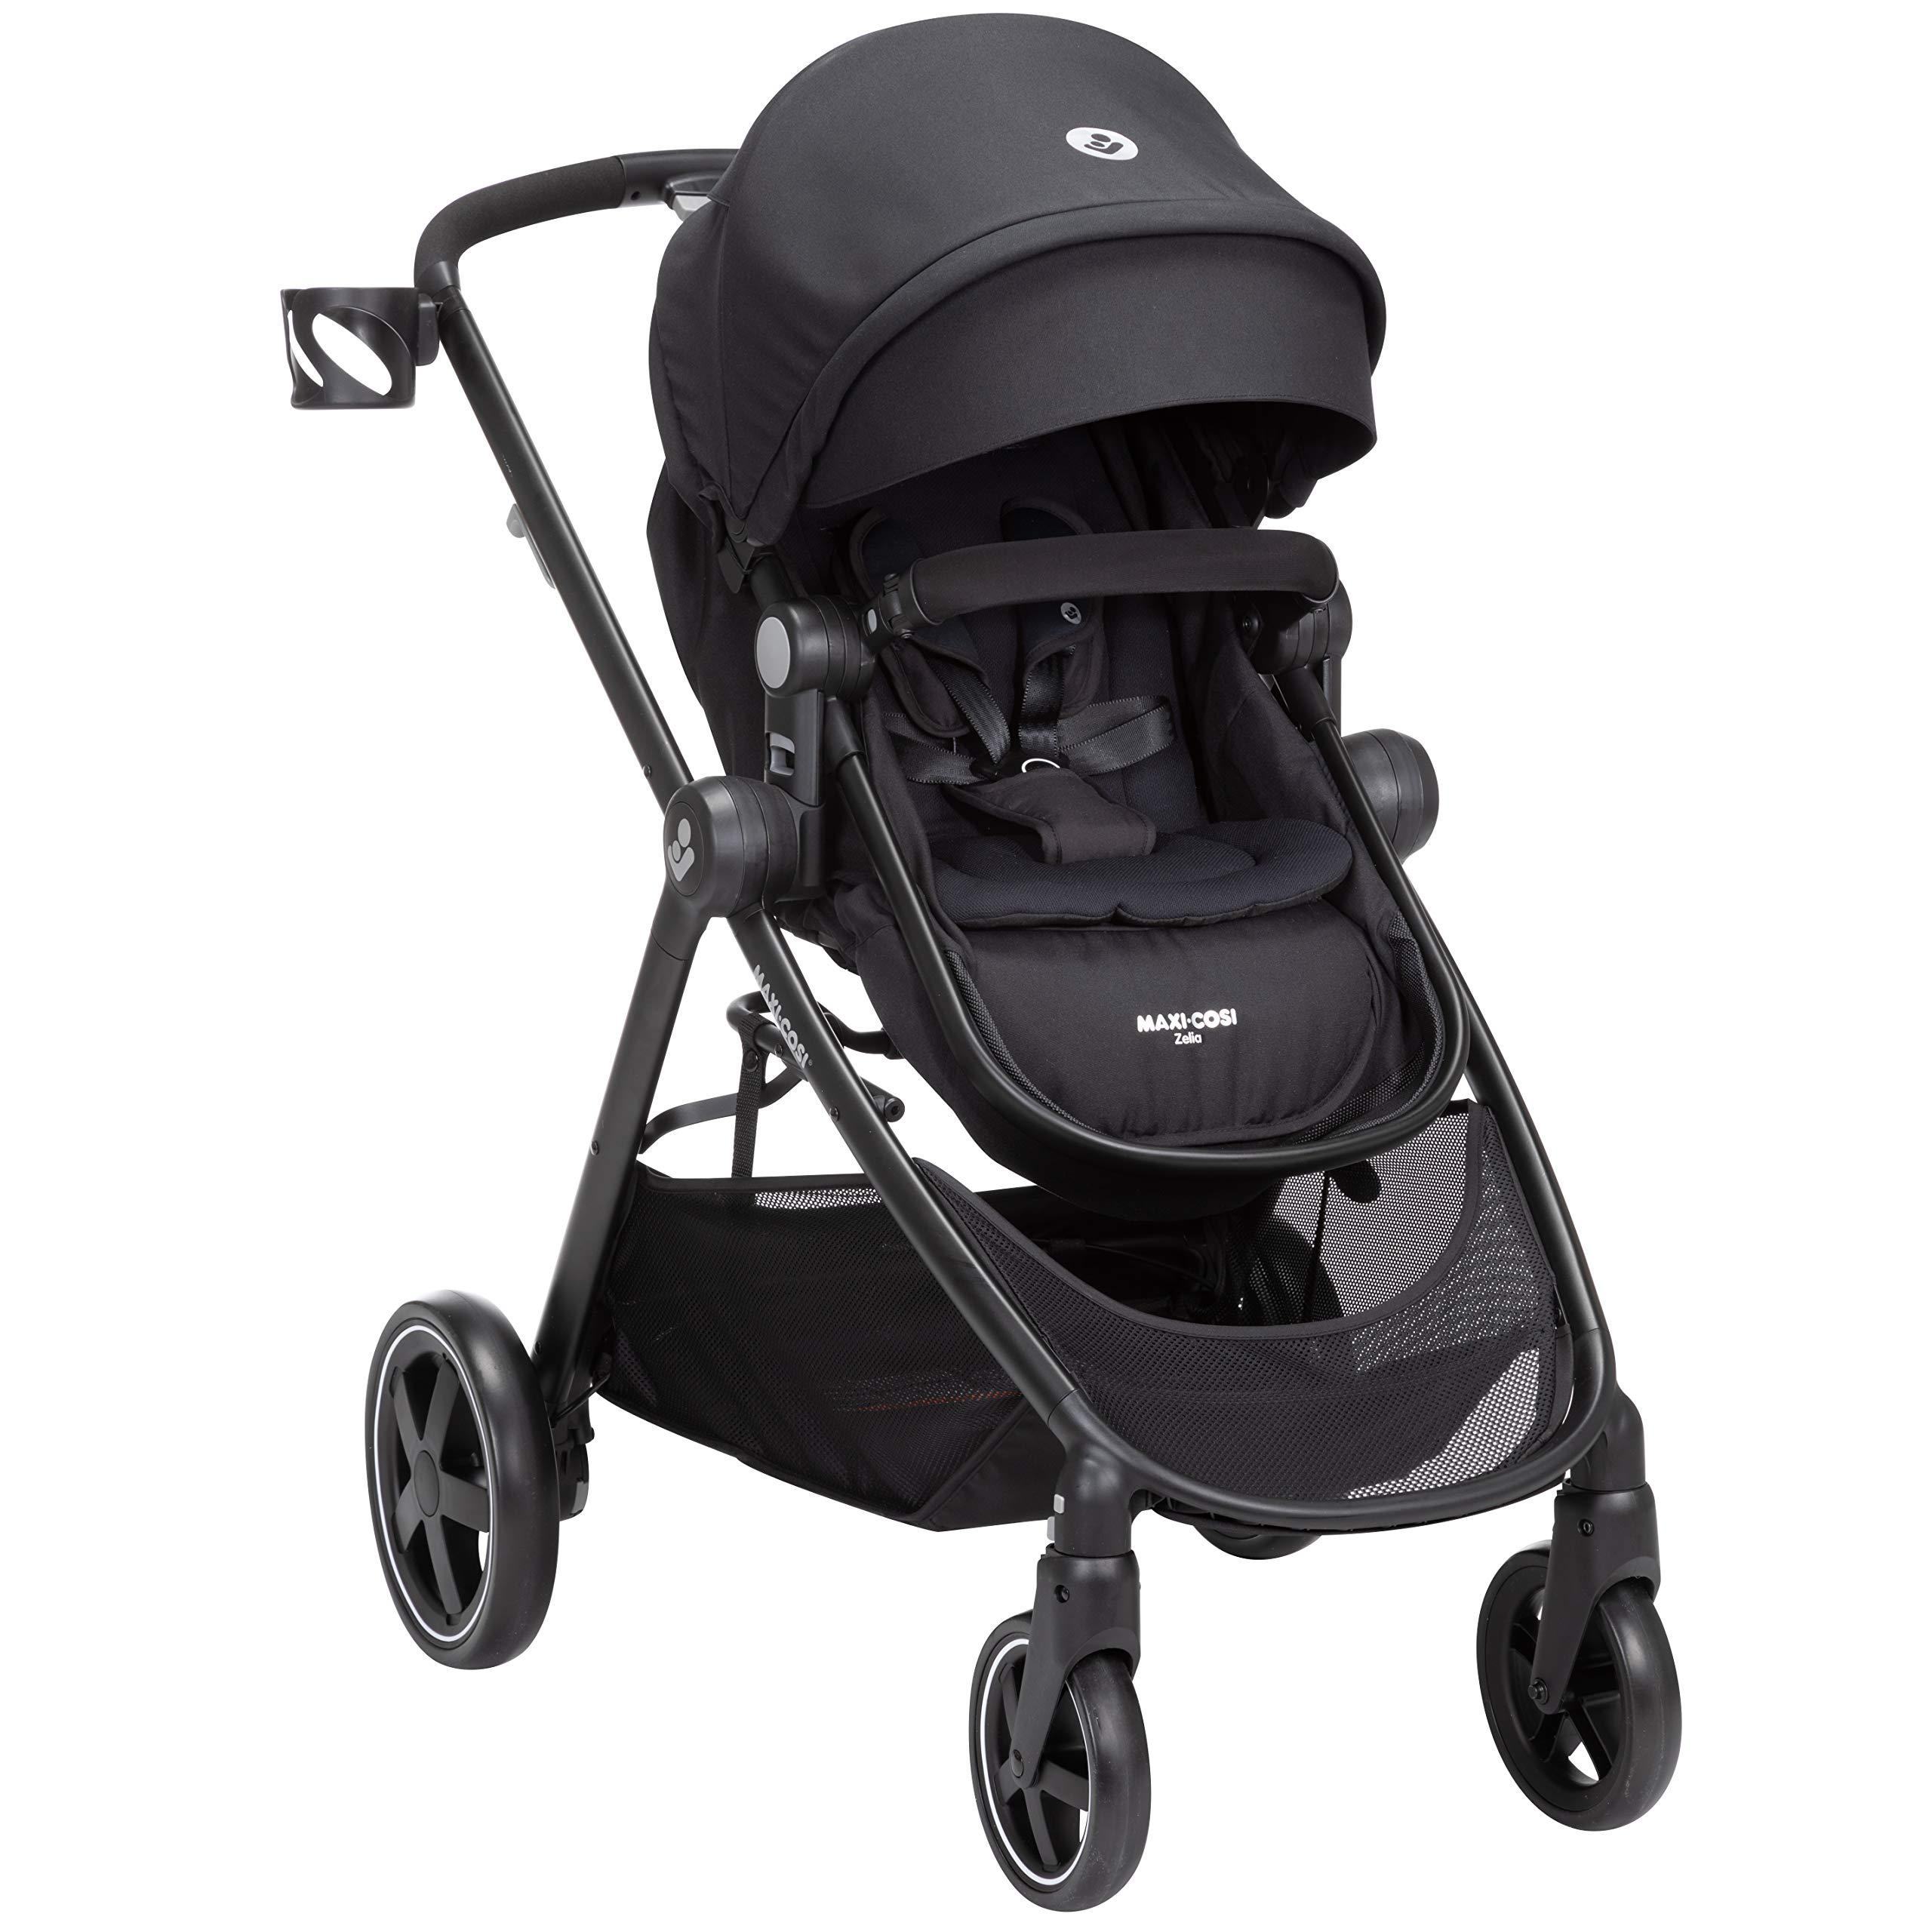 Maxi-Cosi Zelia Stroller, Night Black, One Size by Maxi-Cosi